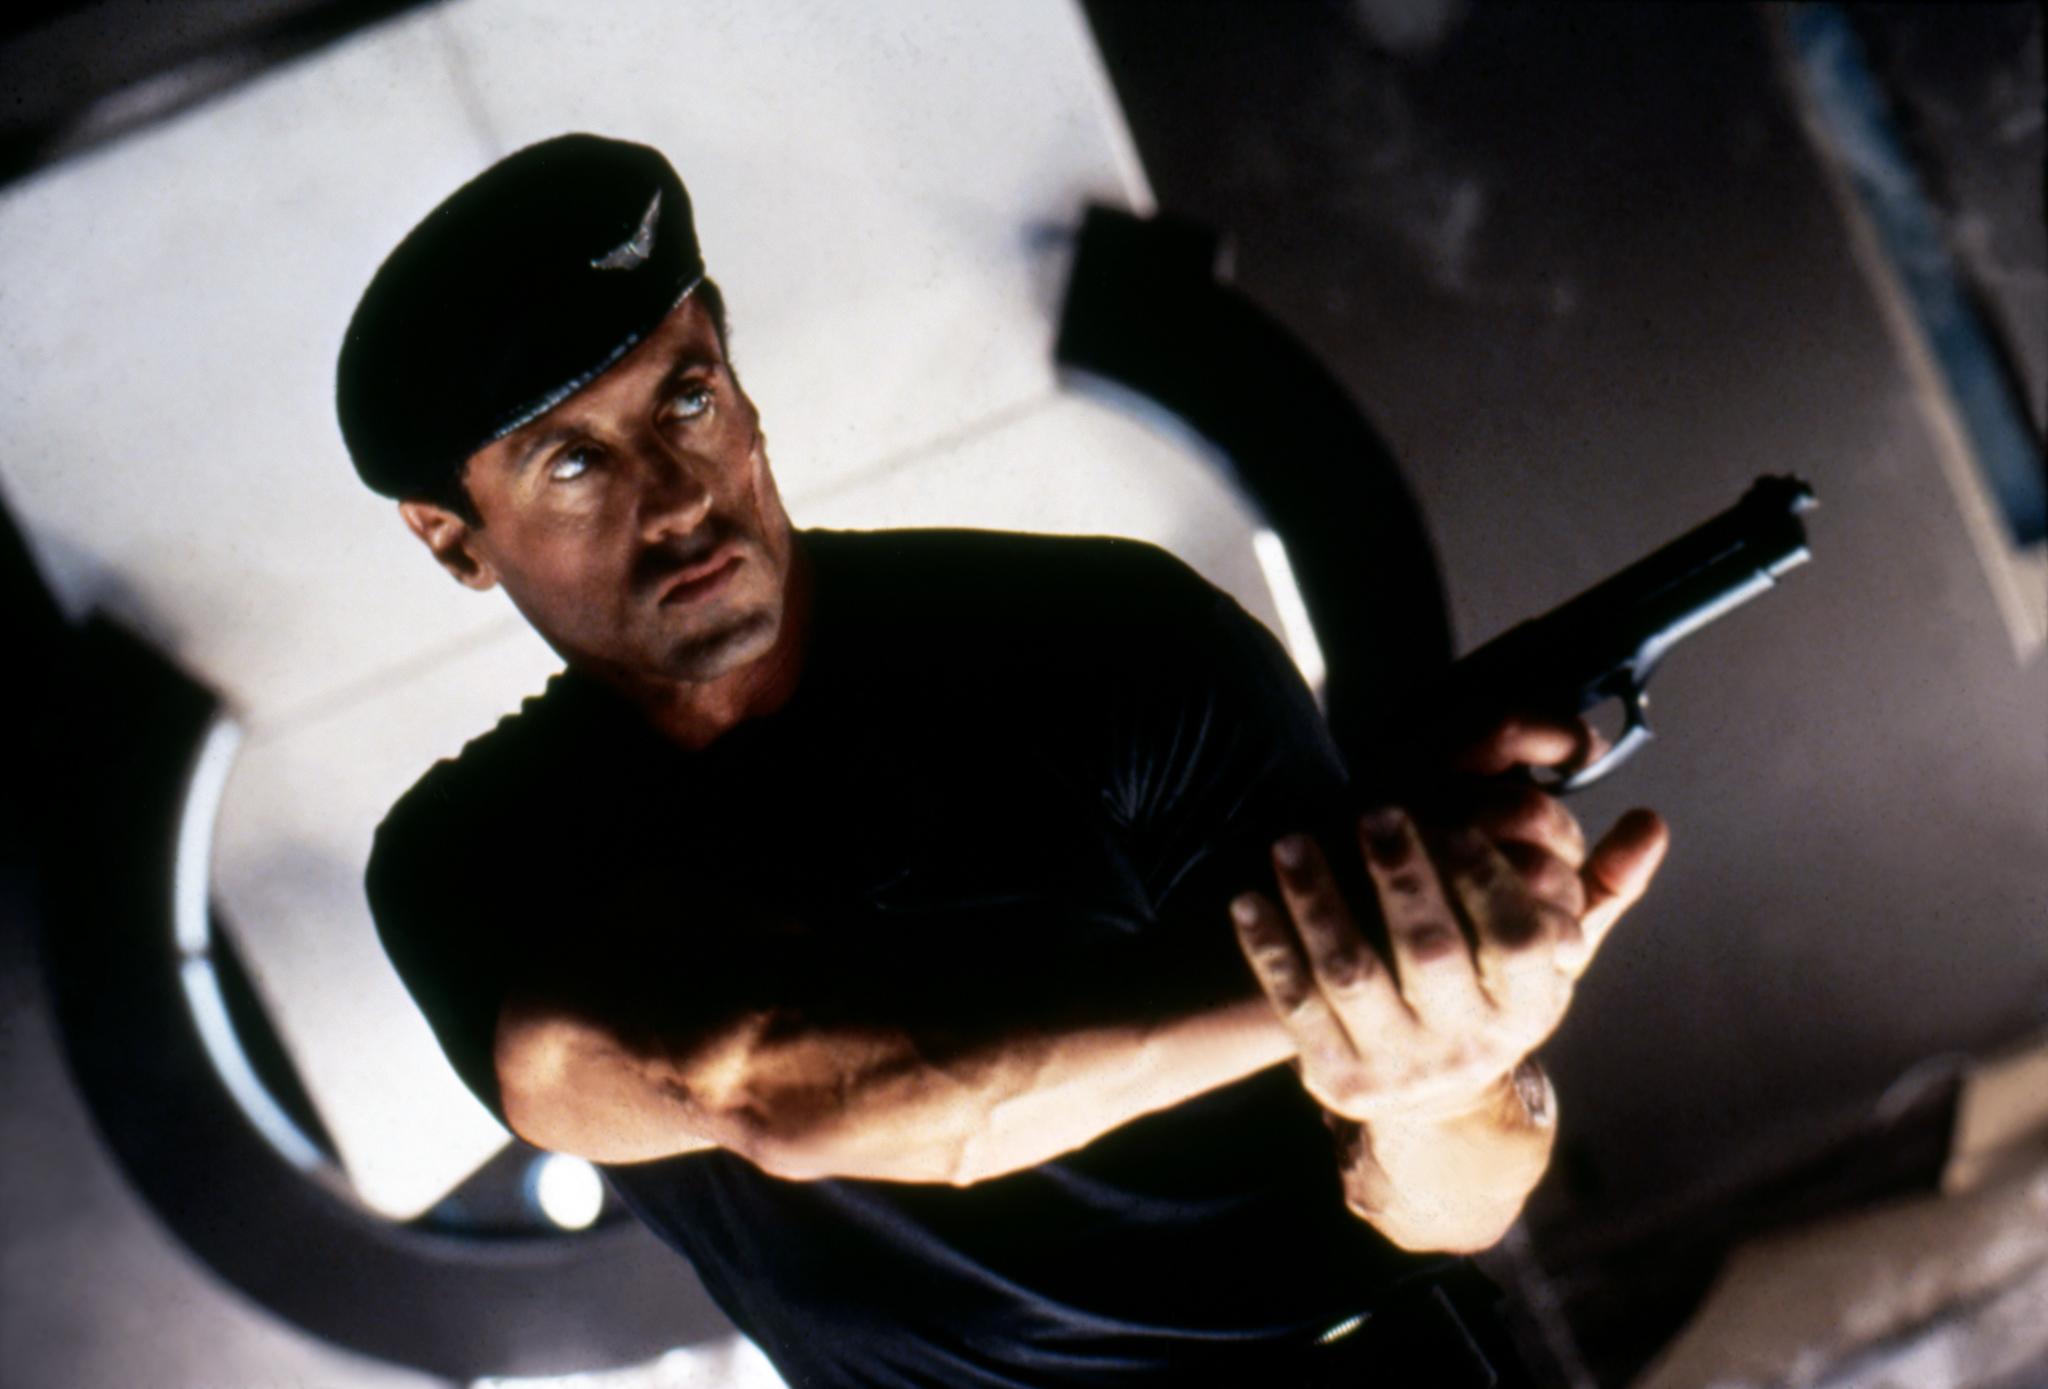 Sylvester Stallone in Demolition Man (1993)